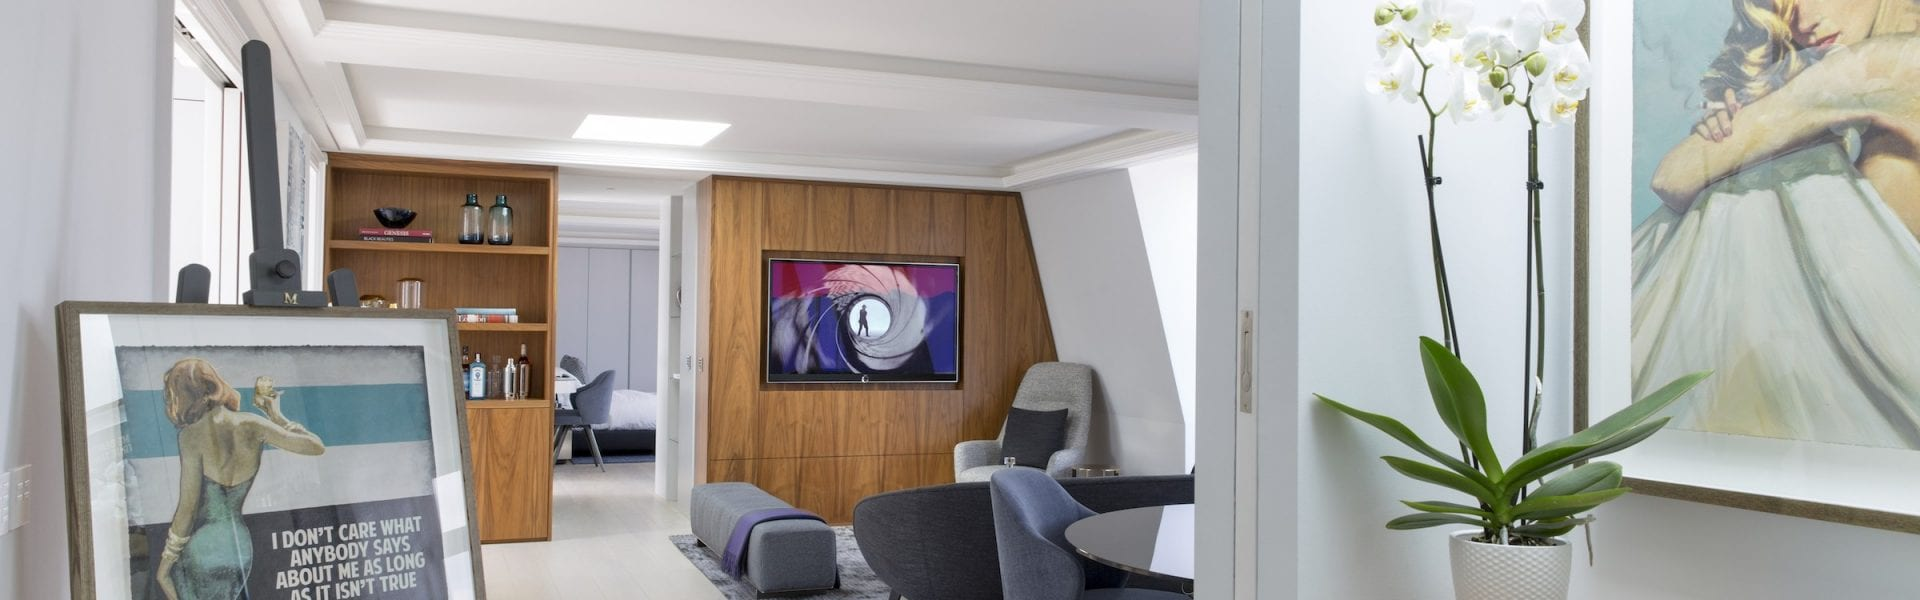 Inside a £3.95 Million Penthouse Designed by Maurizio Pellizzoni